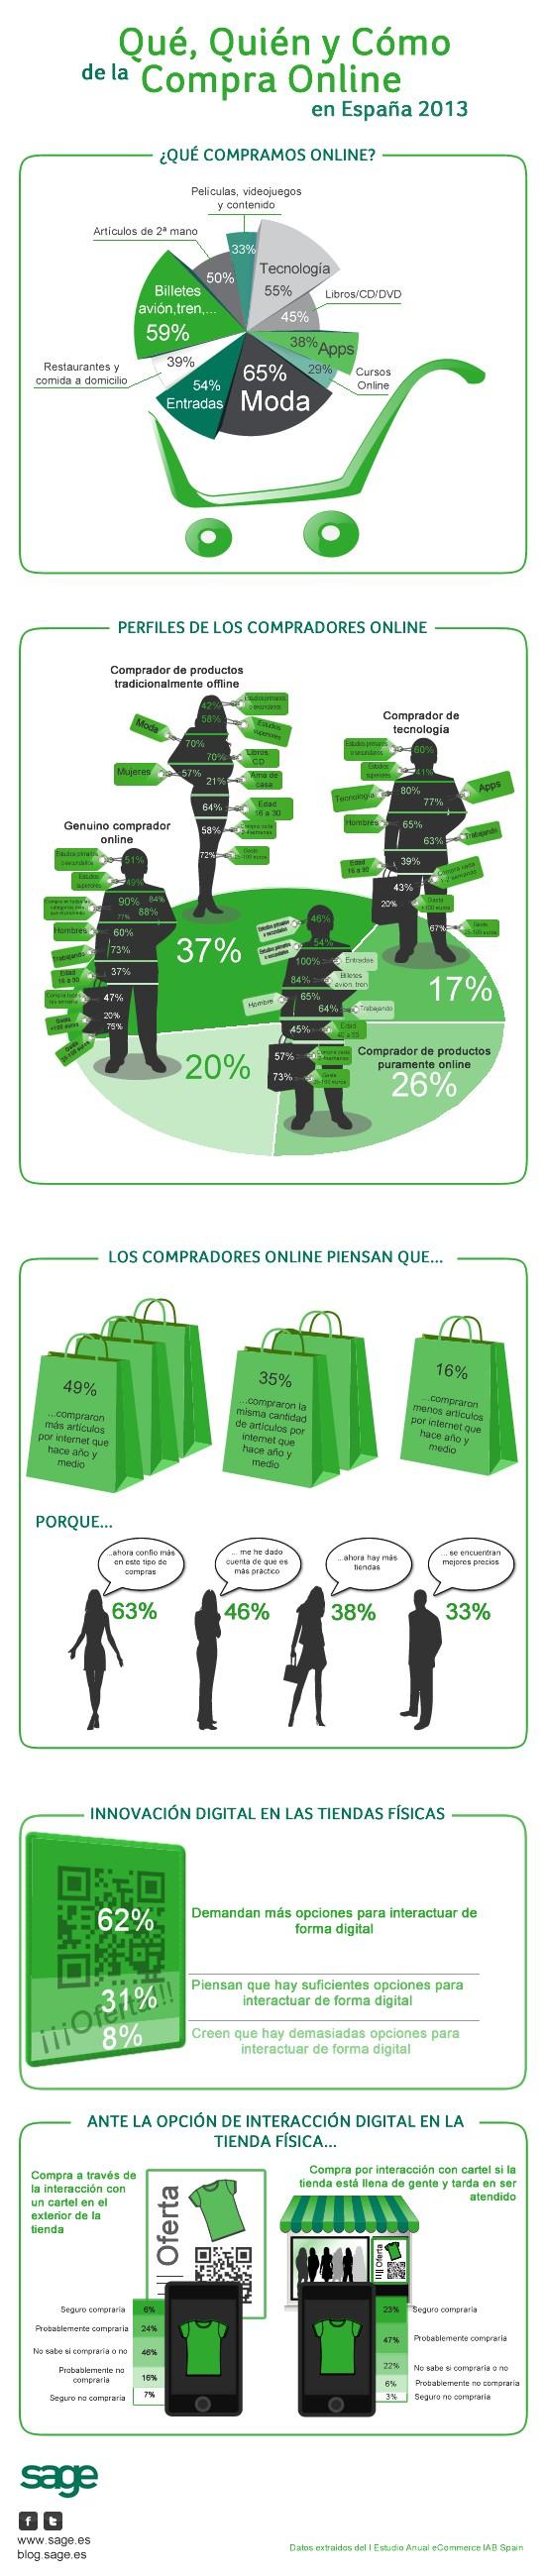 Infografia2-compra-online2013-550px